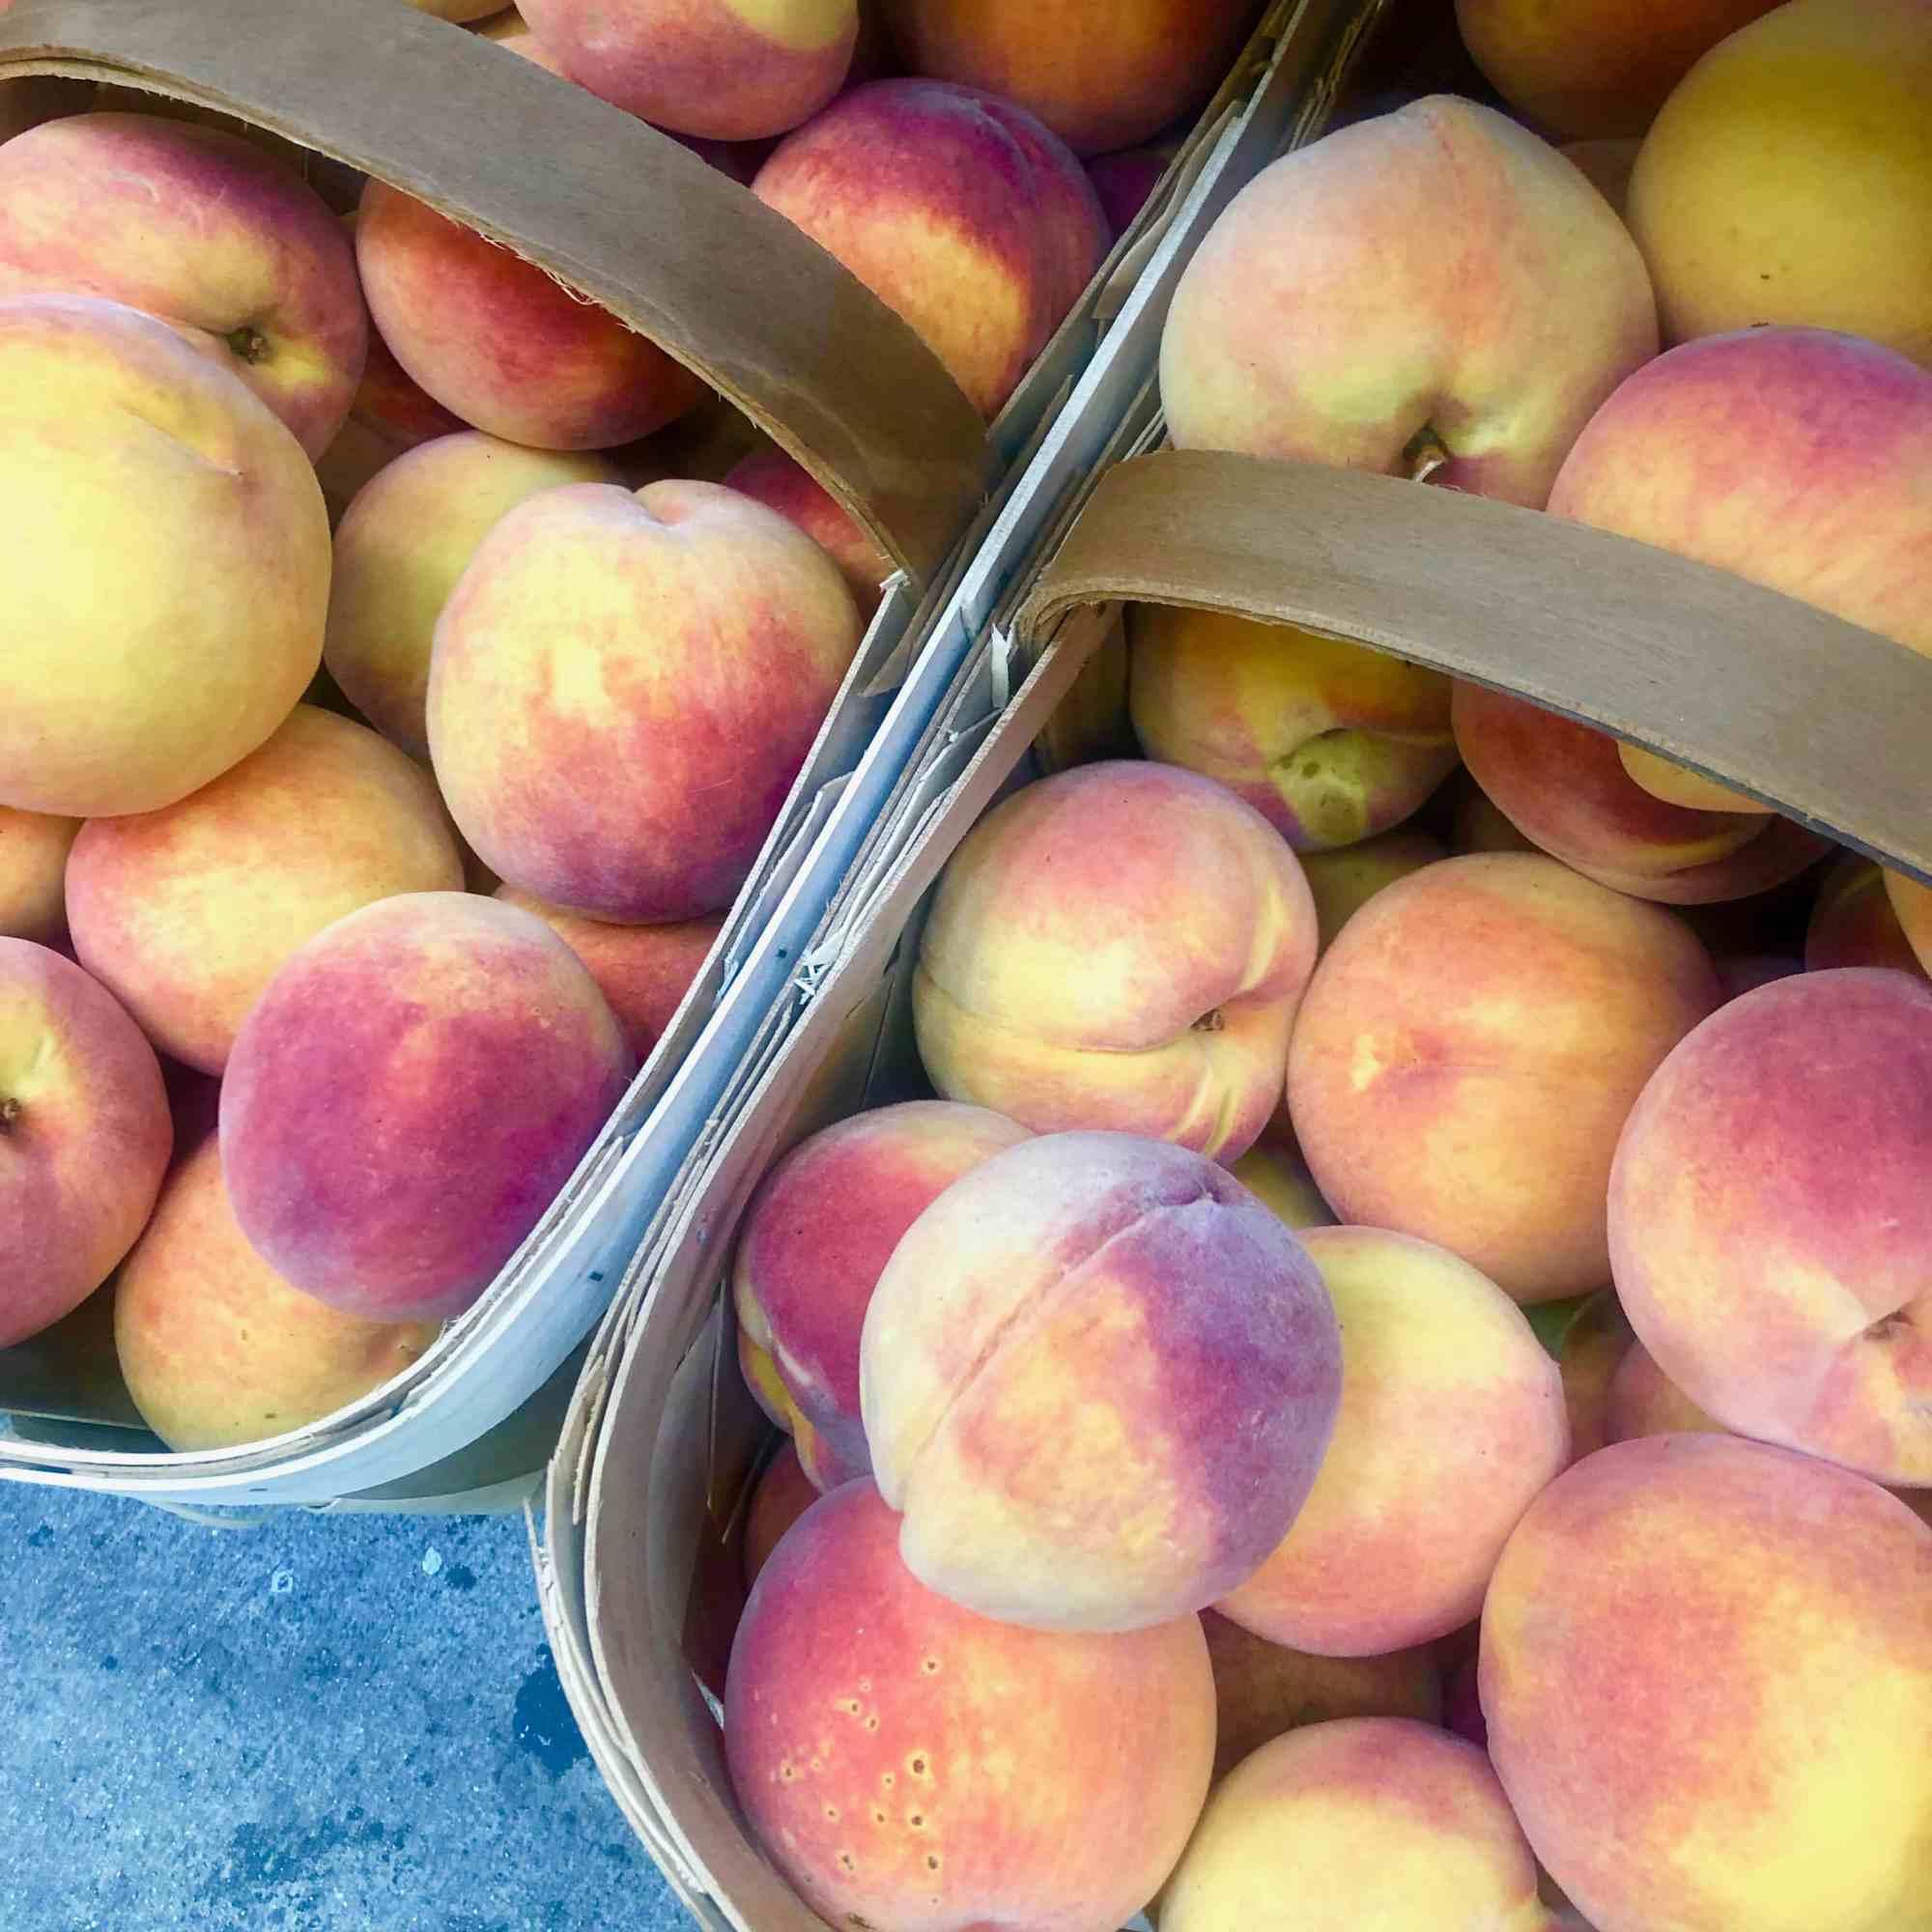 peaches in a basket at farmer's market